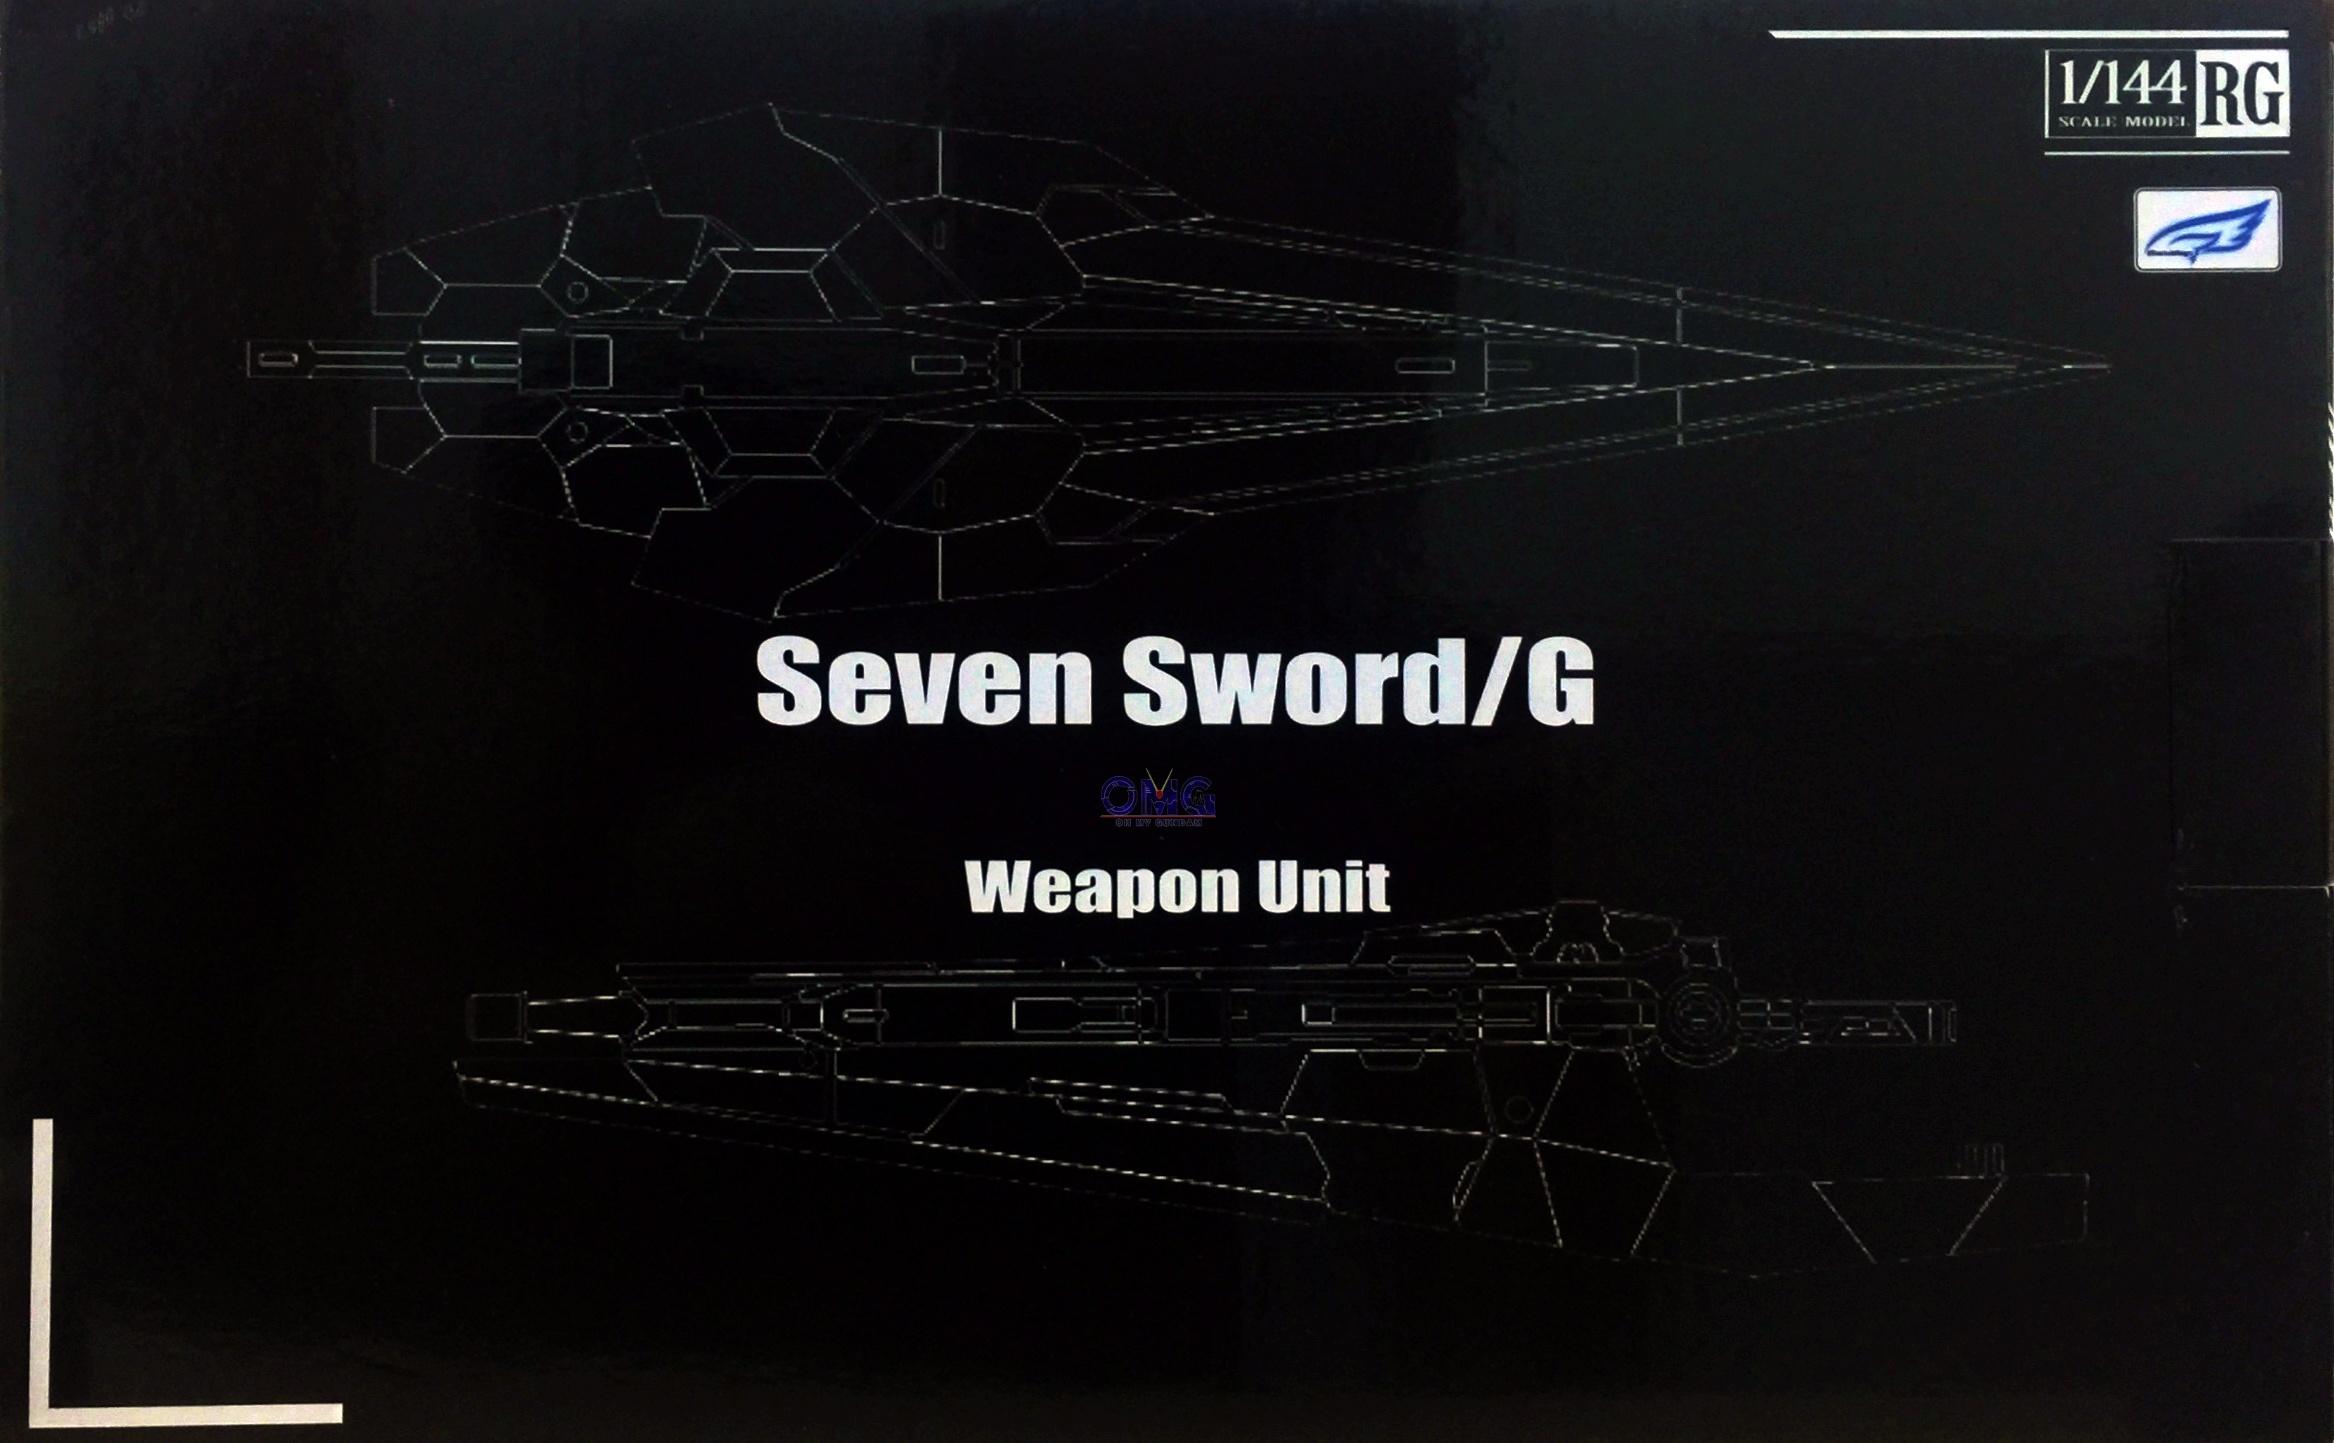 Seven Sword G Weapon Unit.jpg